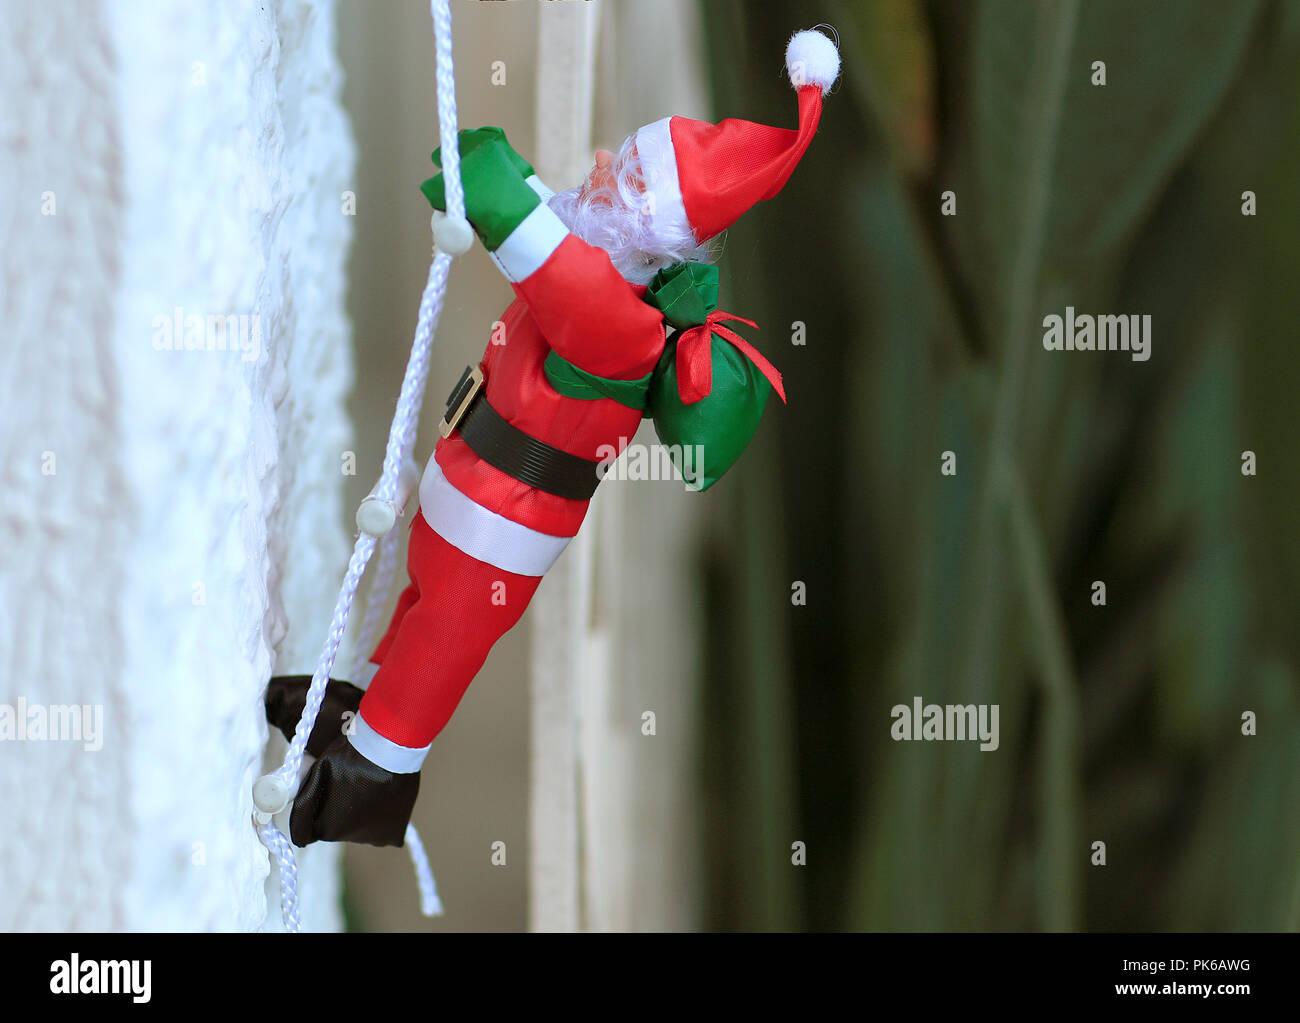 Merry Christmas Religious.Santa Claus Climbing The Chimney Merry Christmas Religious